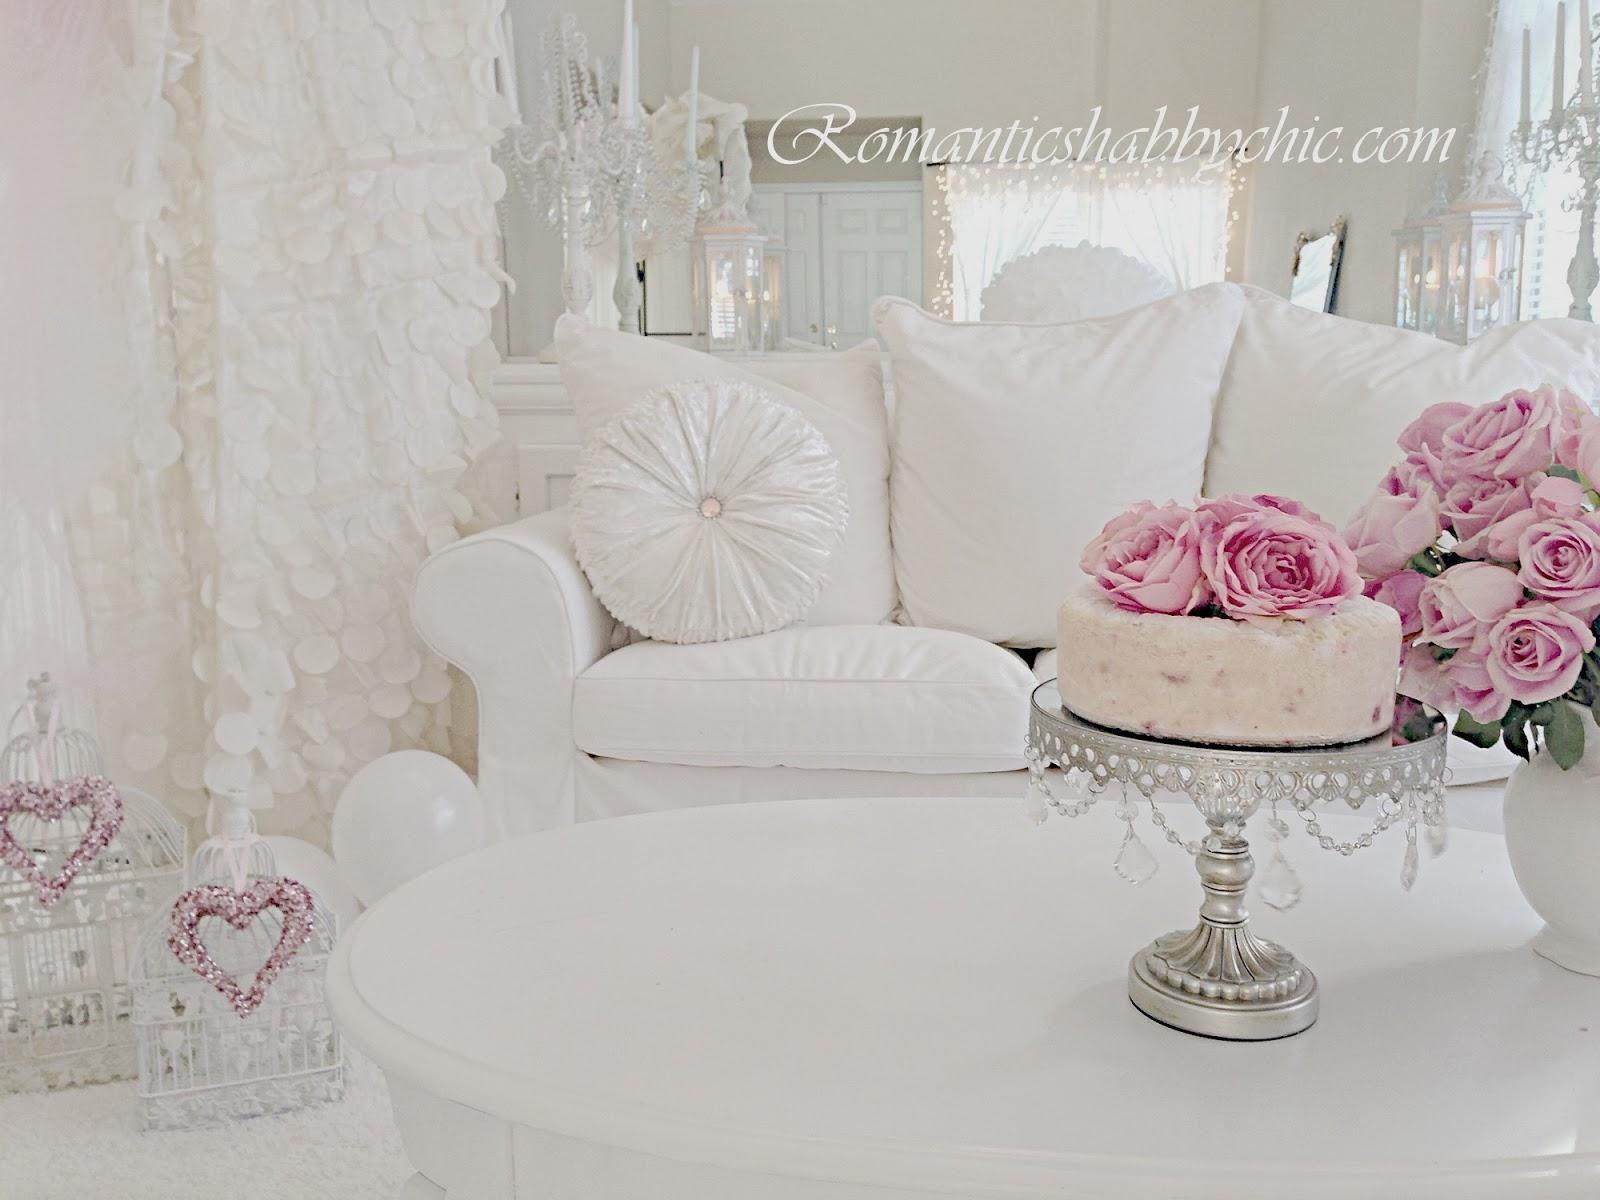 Romantic shabby chic home romantic shabby chic blog - What is shabby chic ...